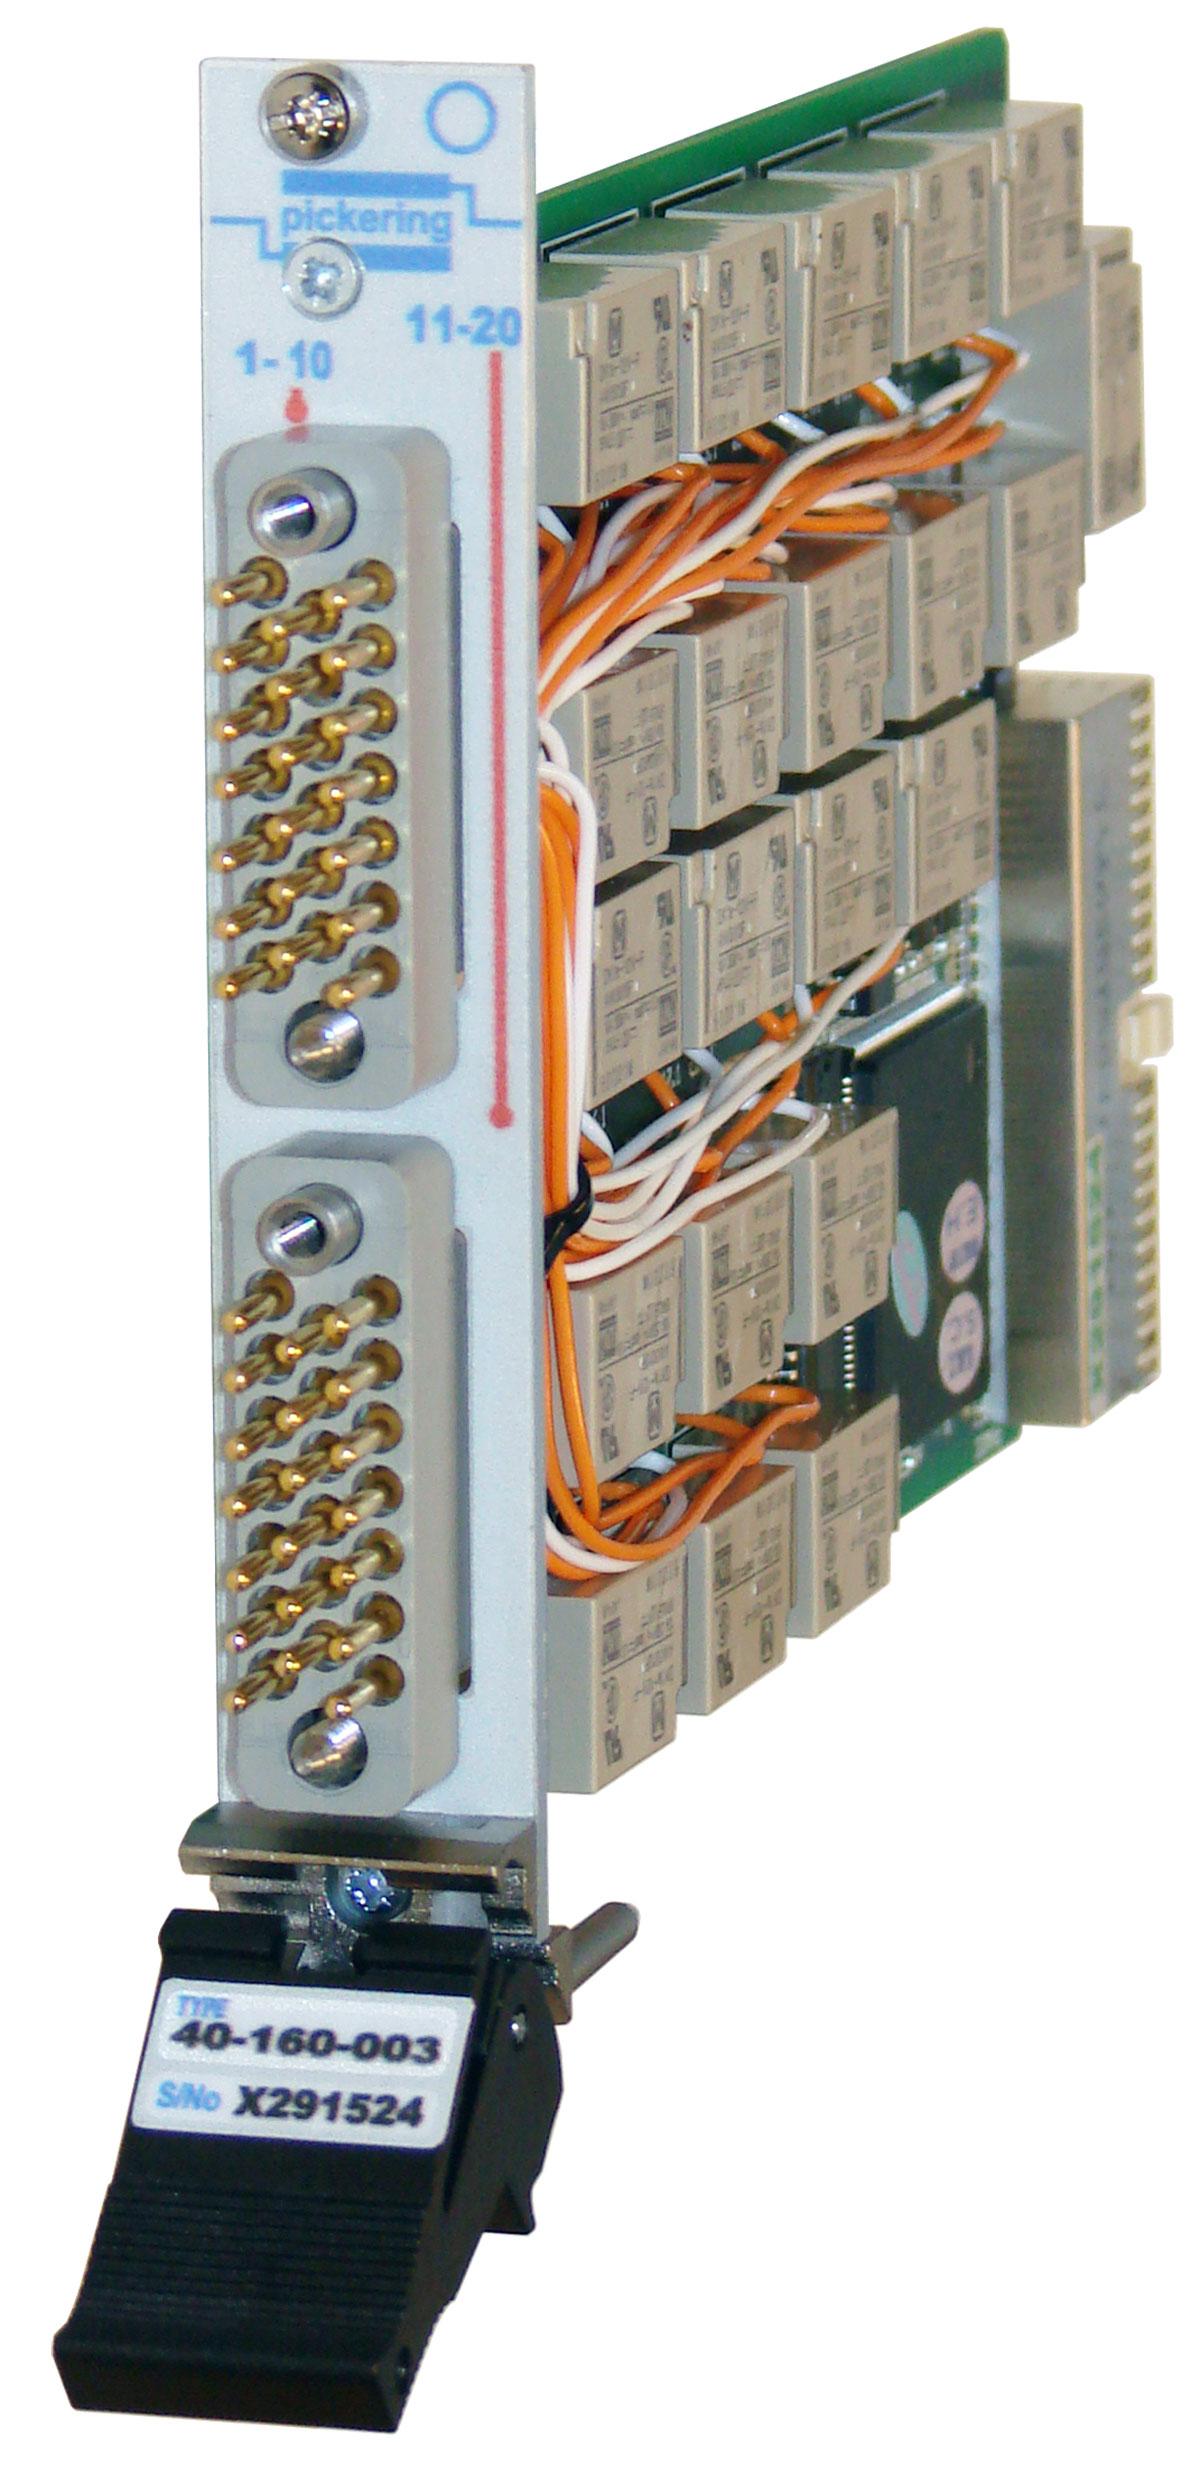 PXI 20 x SPST 10 Amp Power Relay Module - 40-160-003